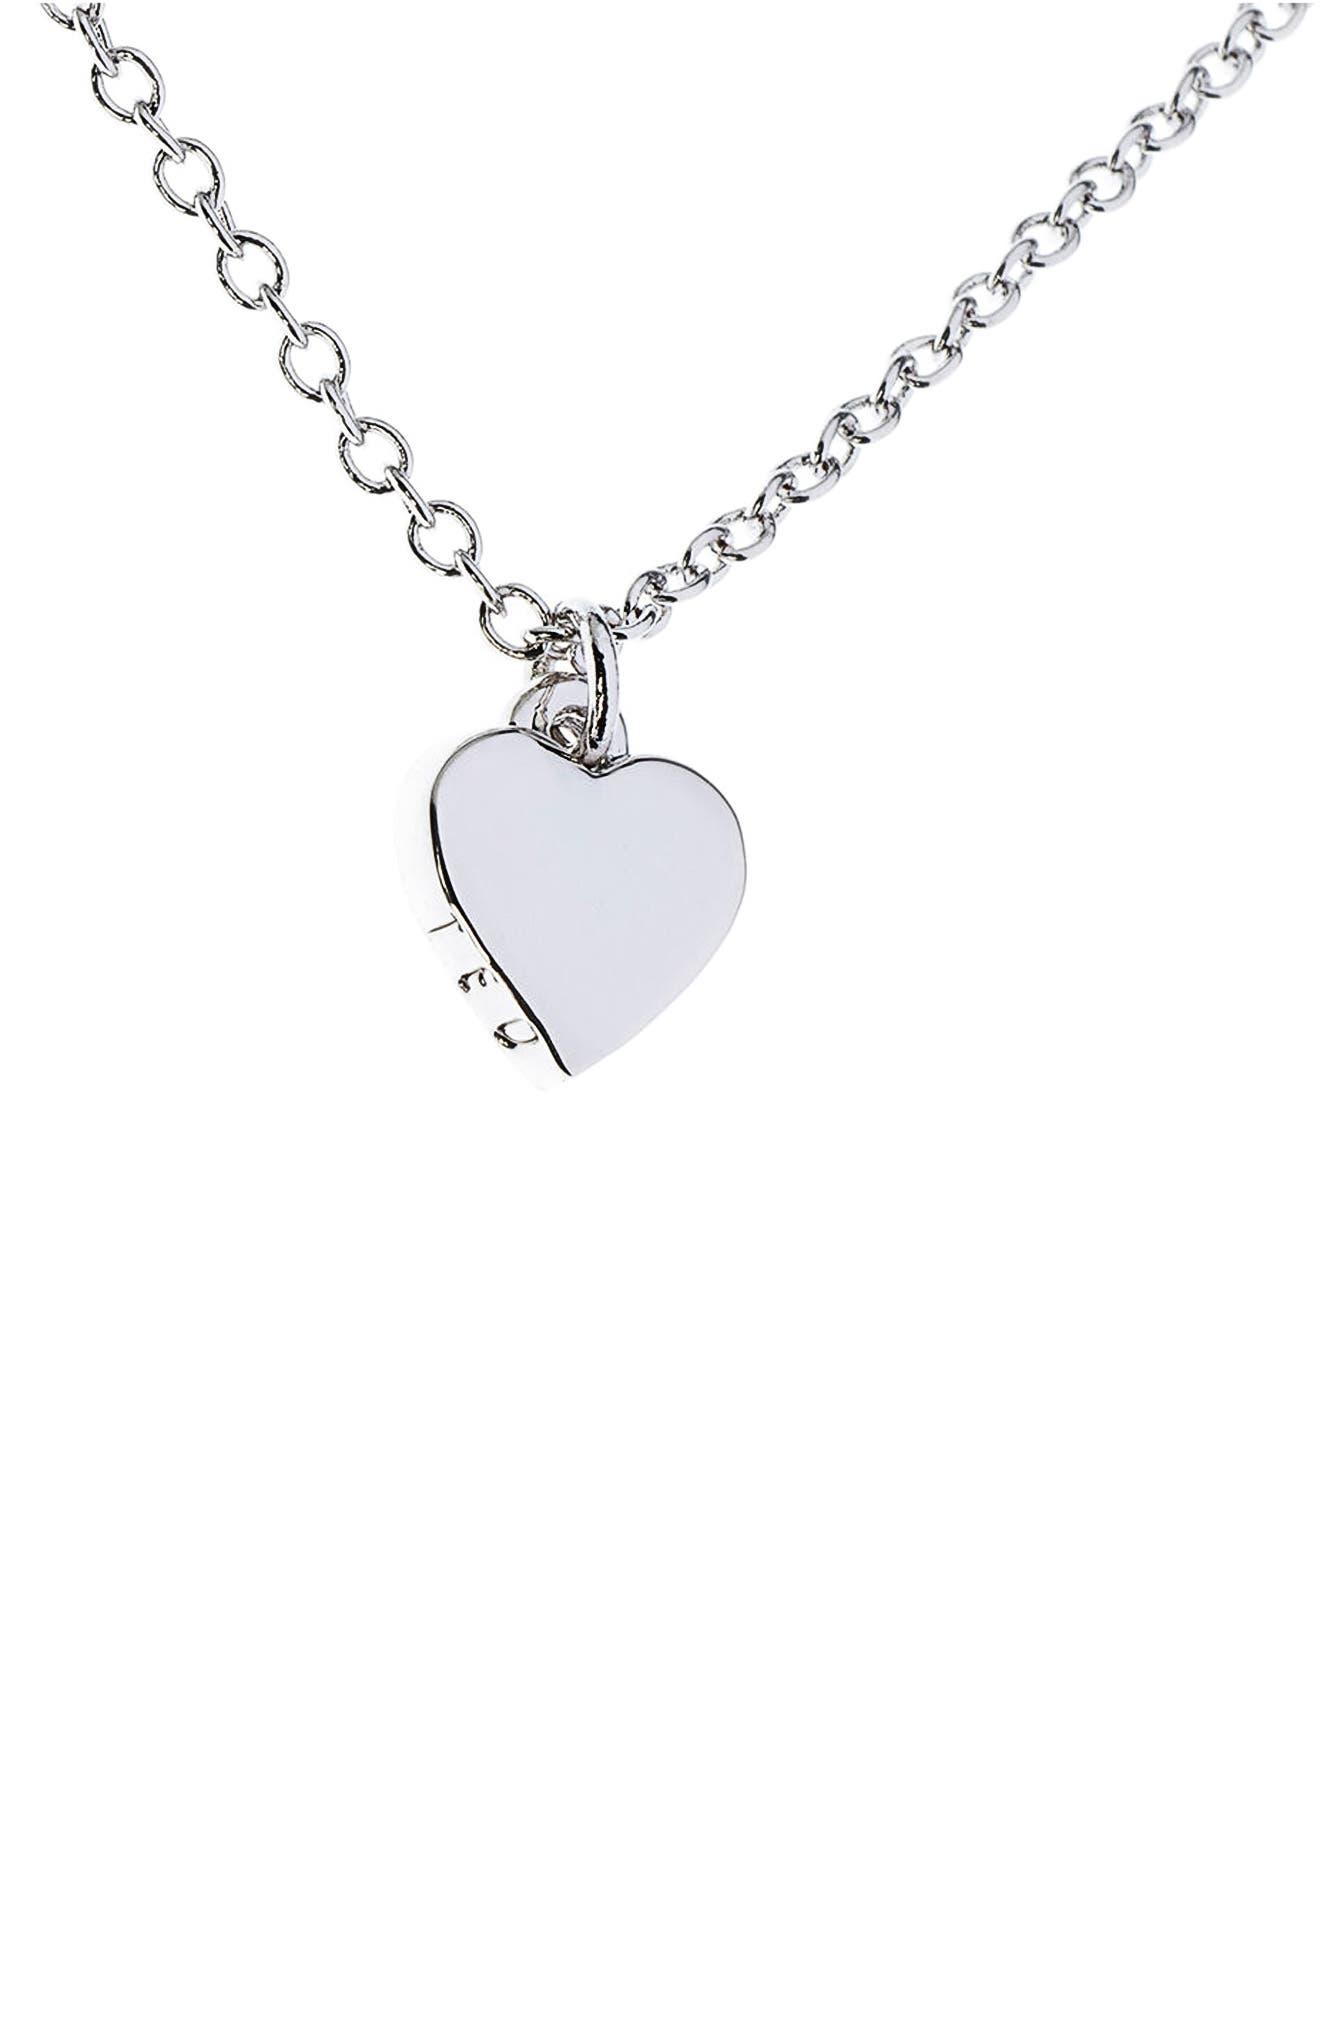 Mini Heart Pendant Necklace,                             Main thumbnail 1, color,                             040